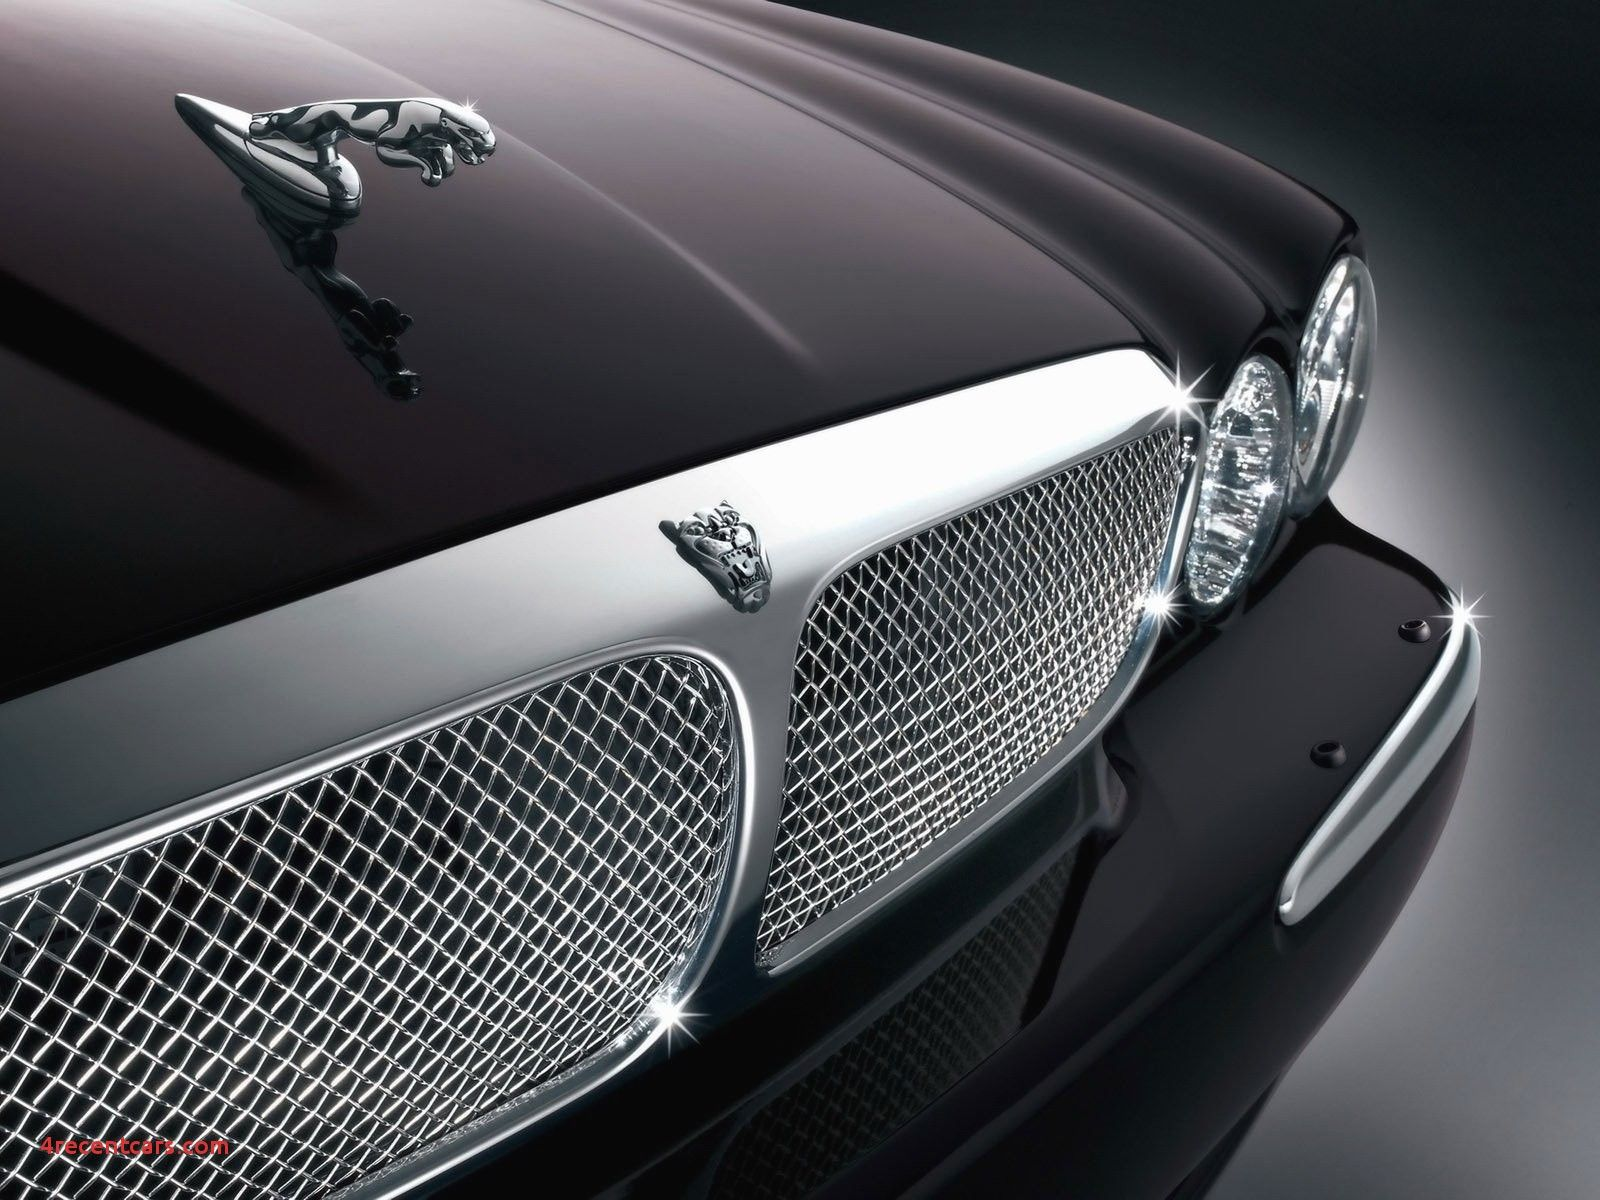 57 Best Free Jaguar Car Hd Wallpapers Wallpaperaccess